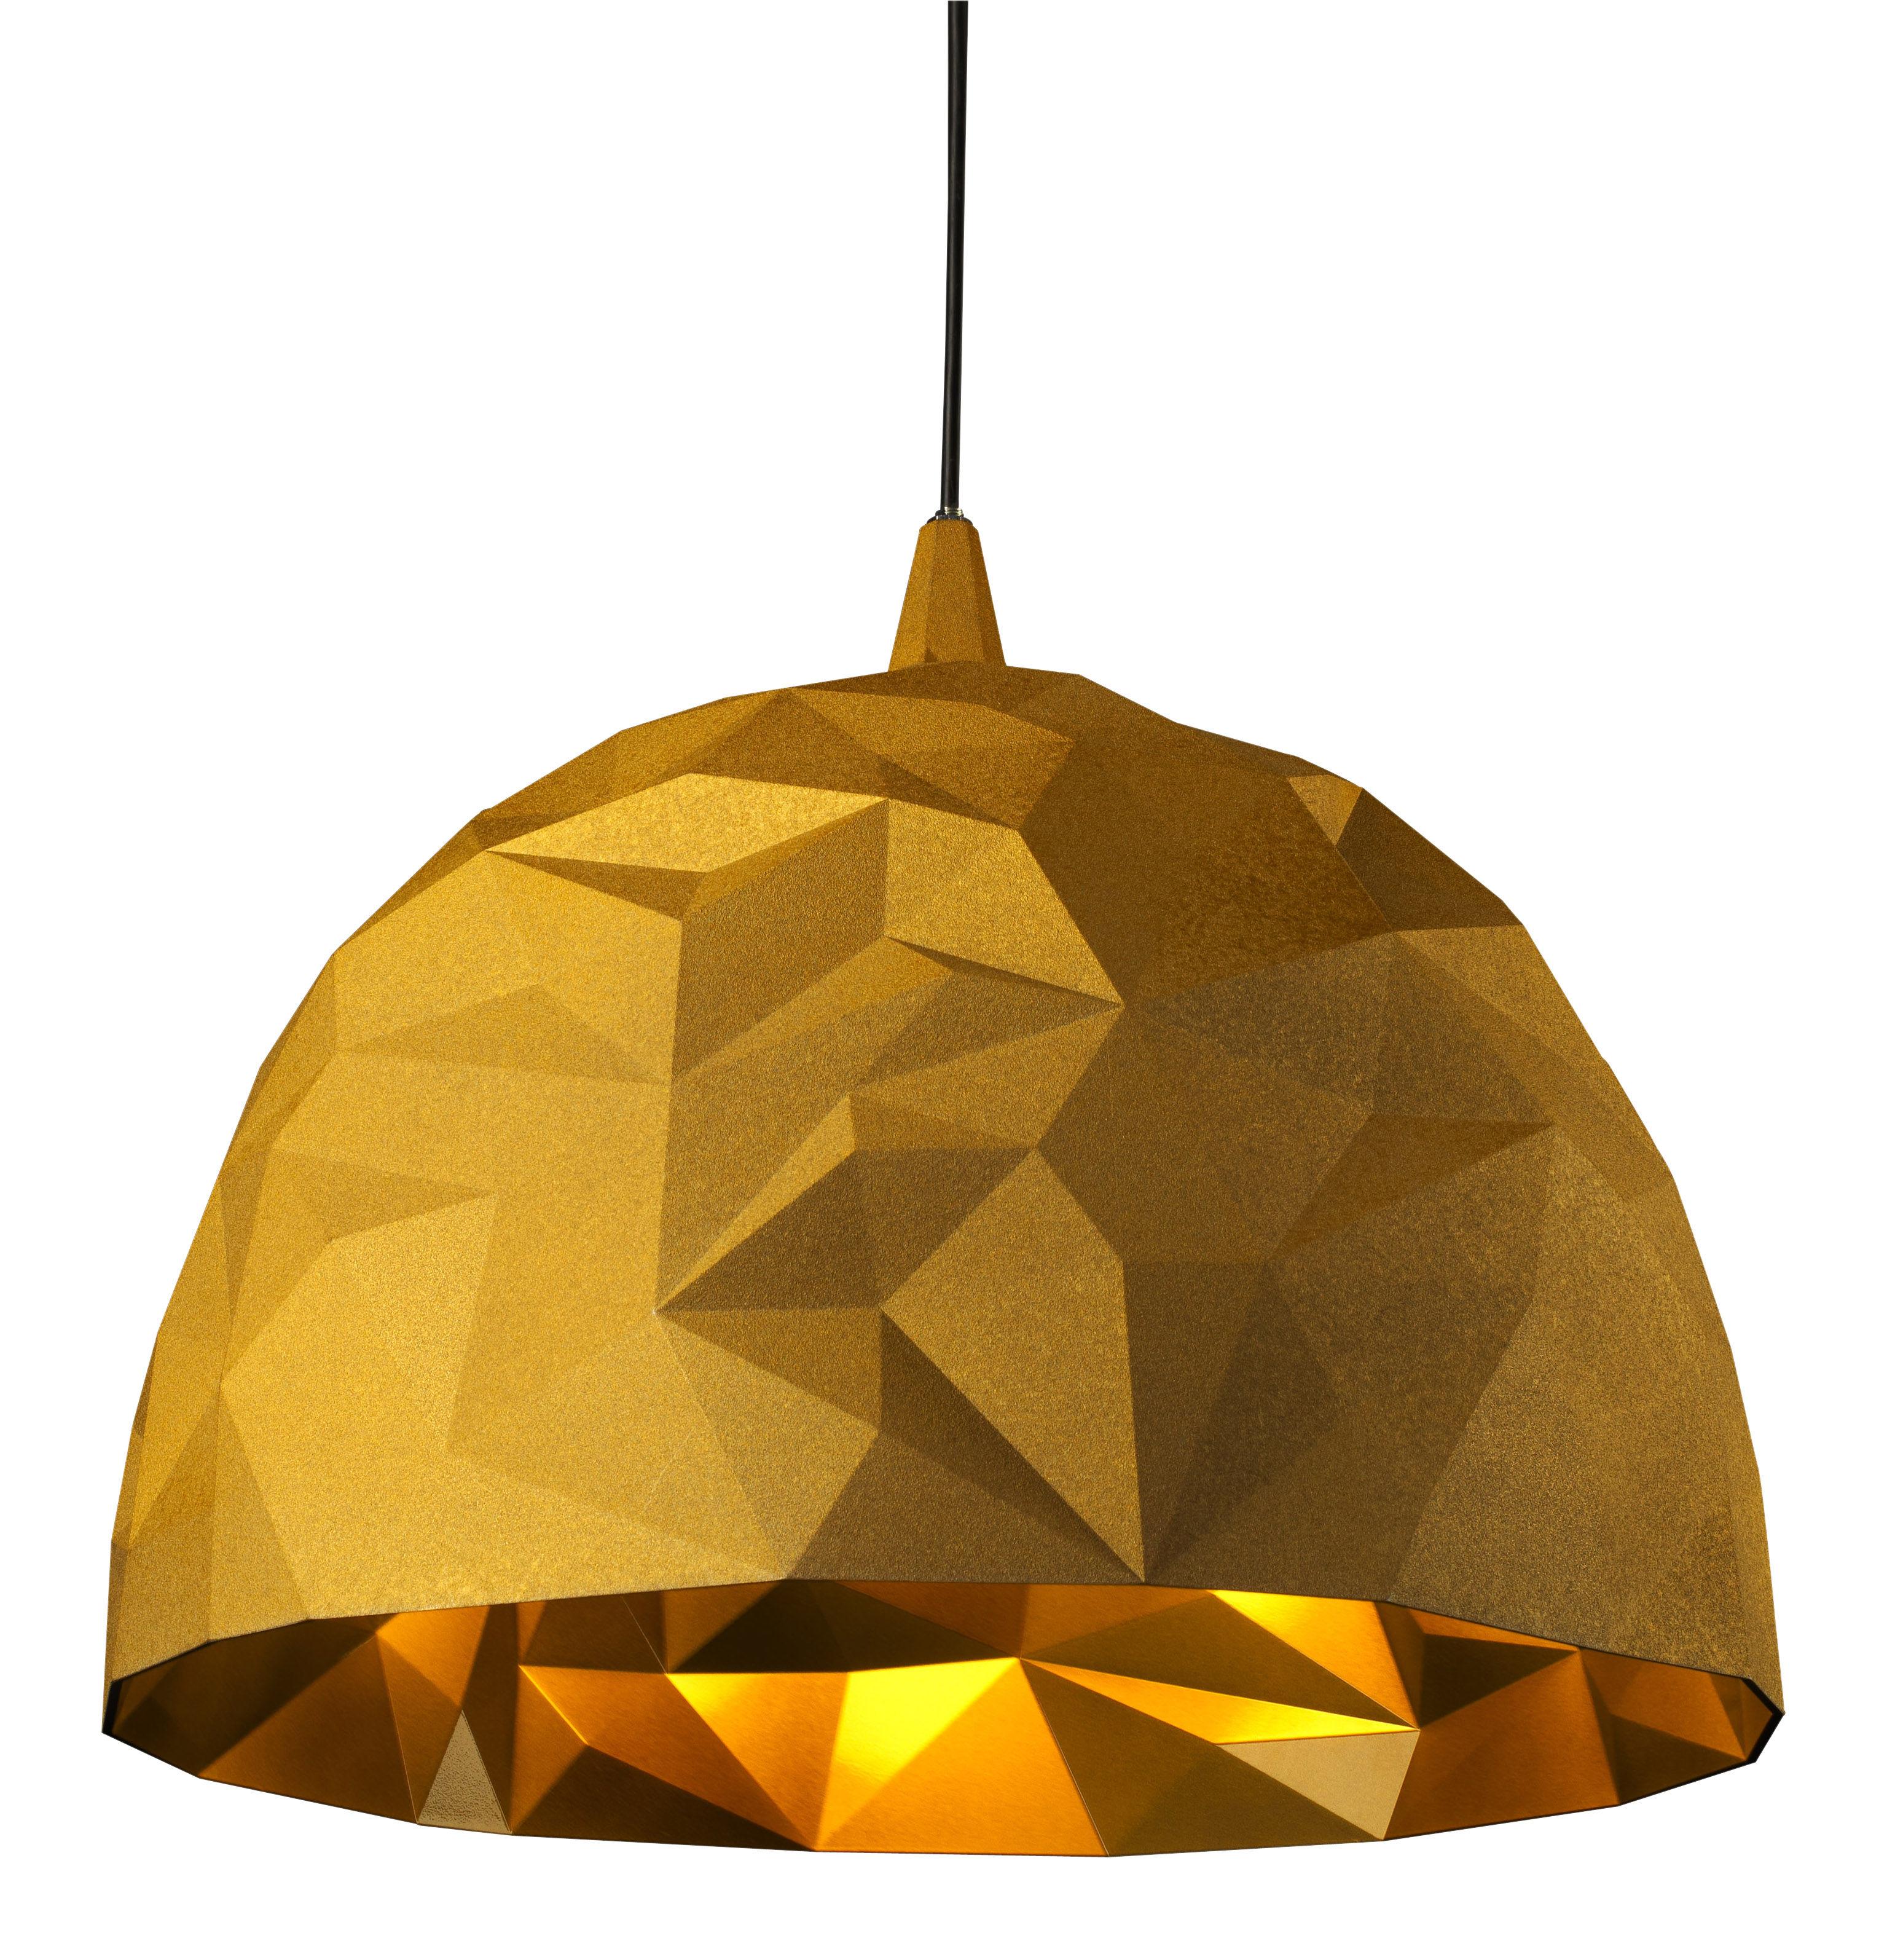 Lighting - Pendant Lighting - Rock Pendant by Diesel with Foscarini - Gold - Polycarbonate